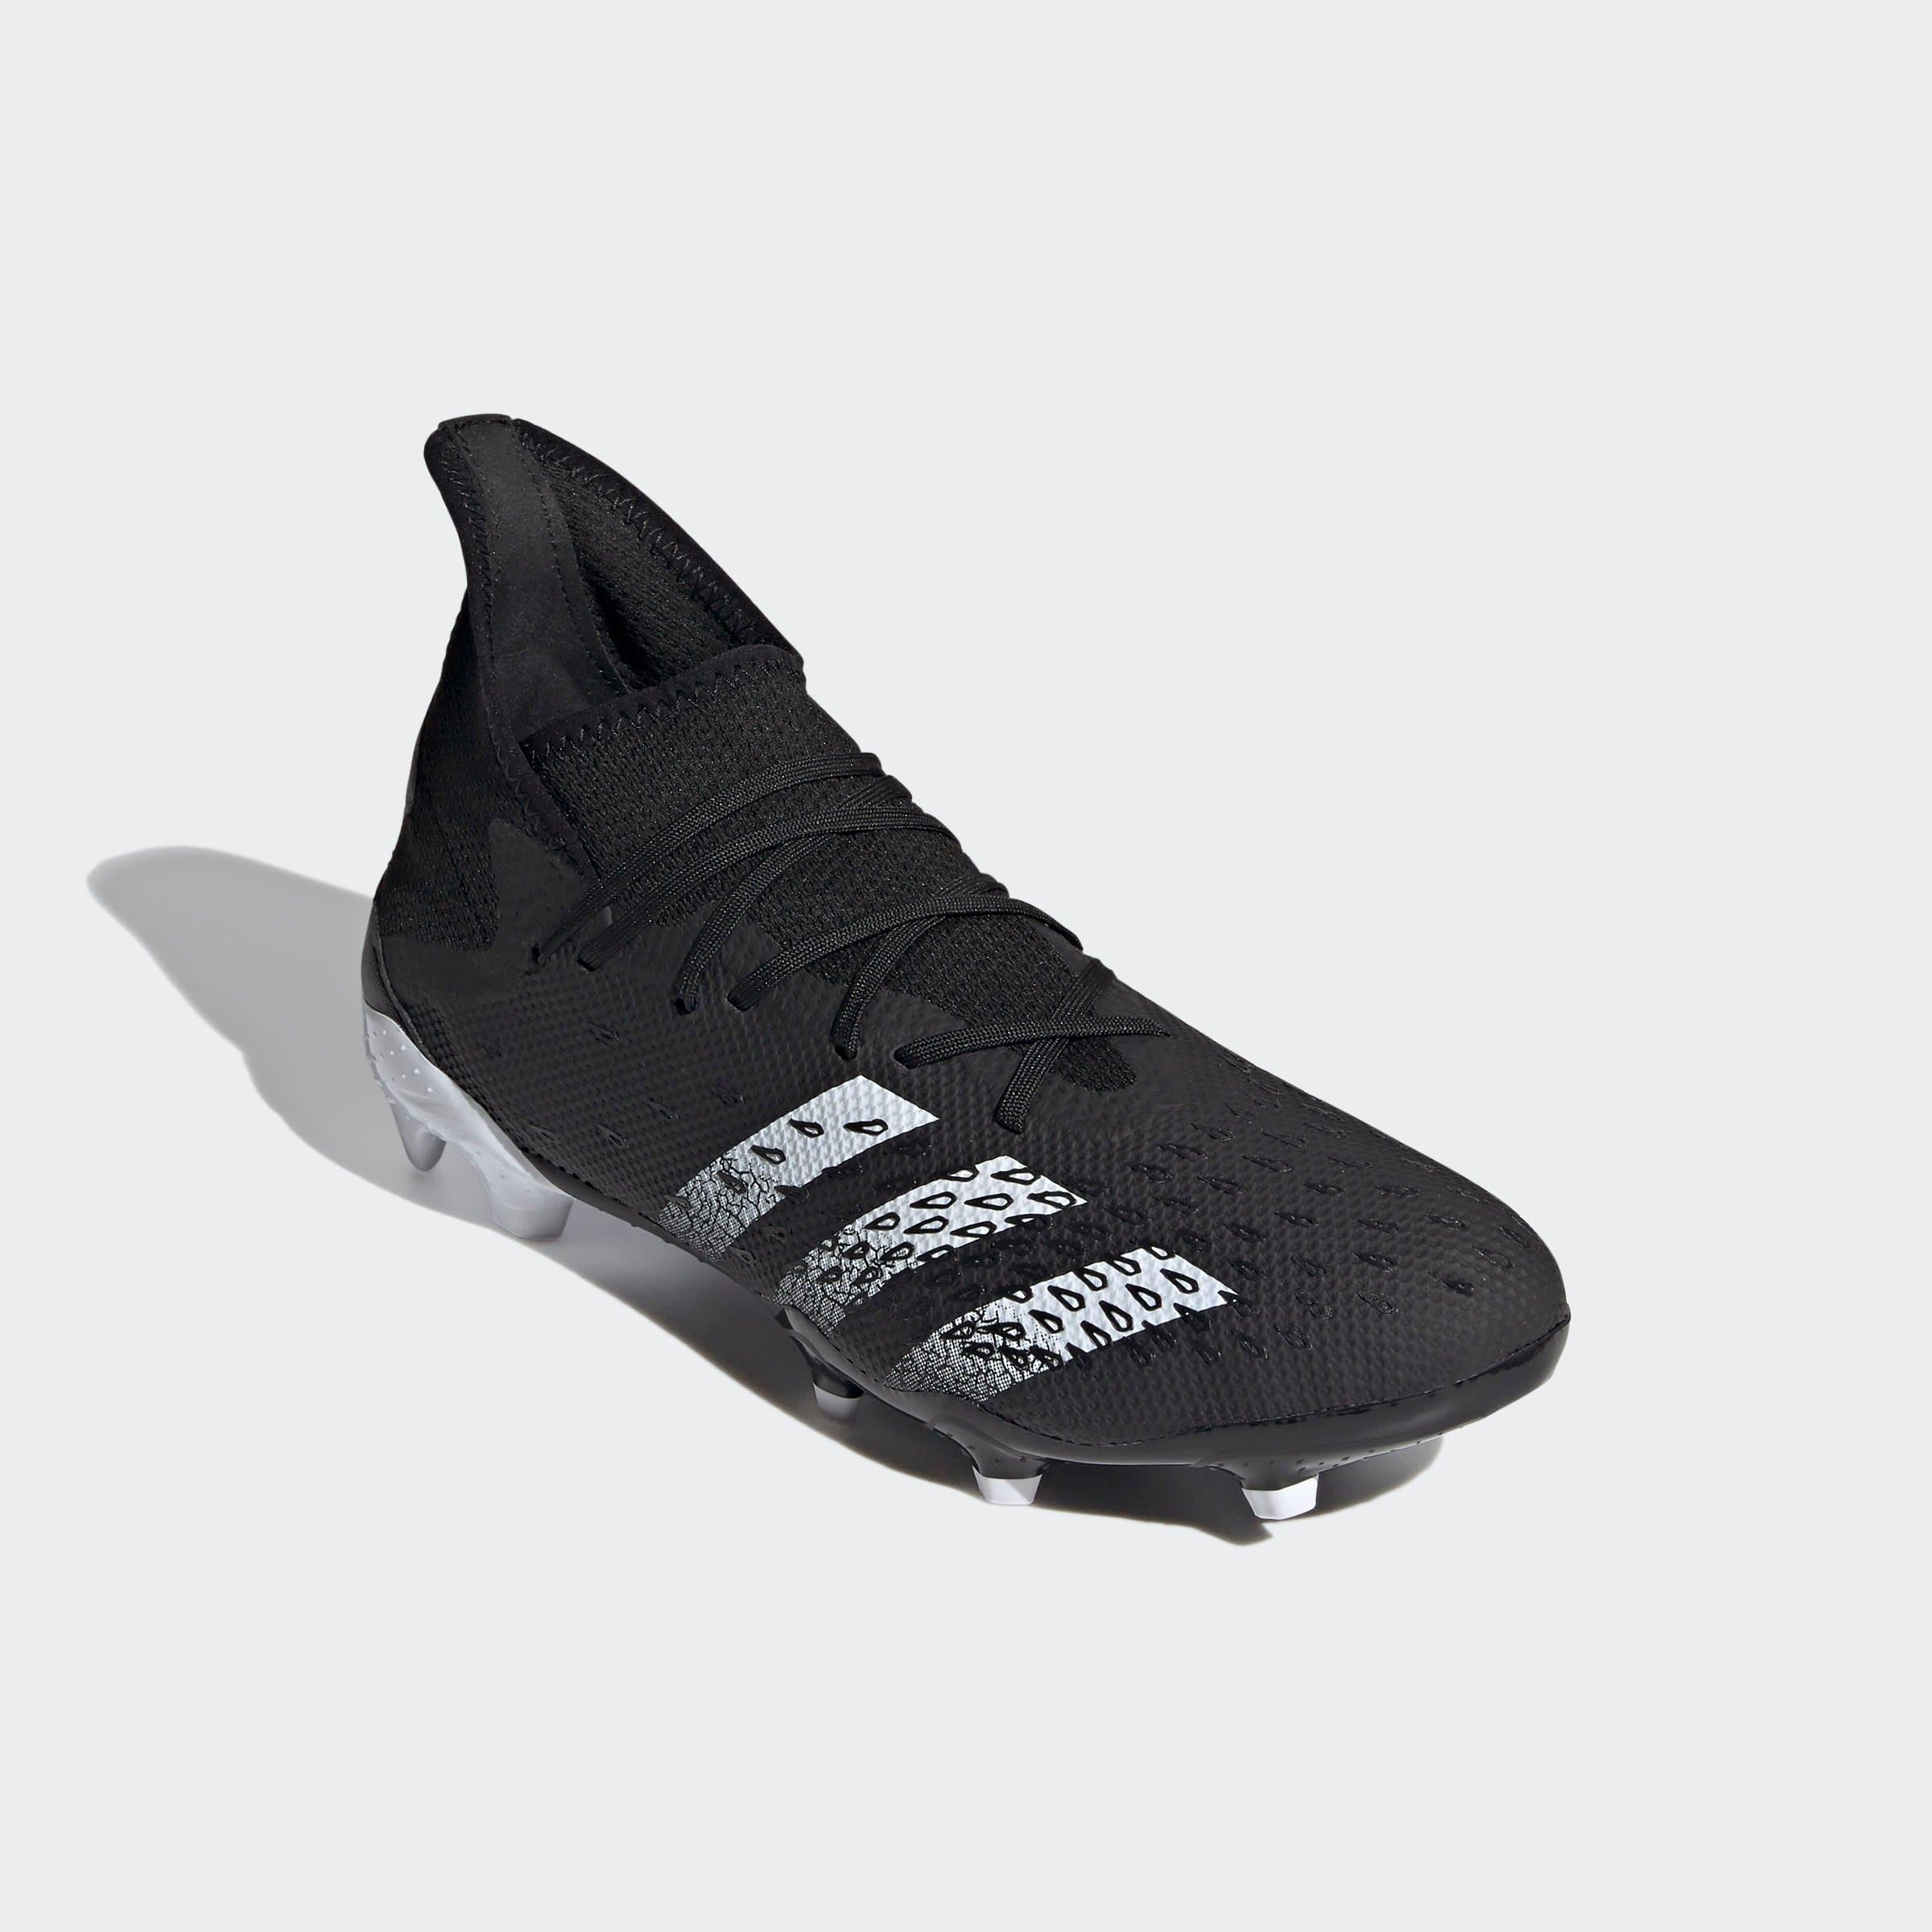 adidas Performance voetbalschoenen PREDATOR FREAK.3 FG online kopen op otto.nl